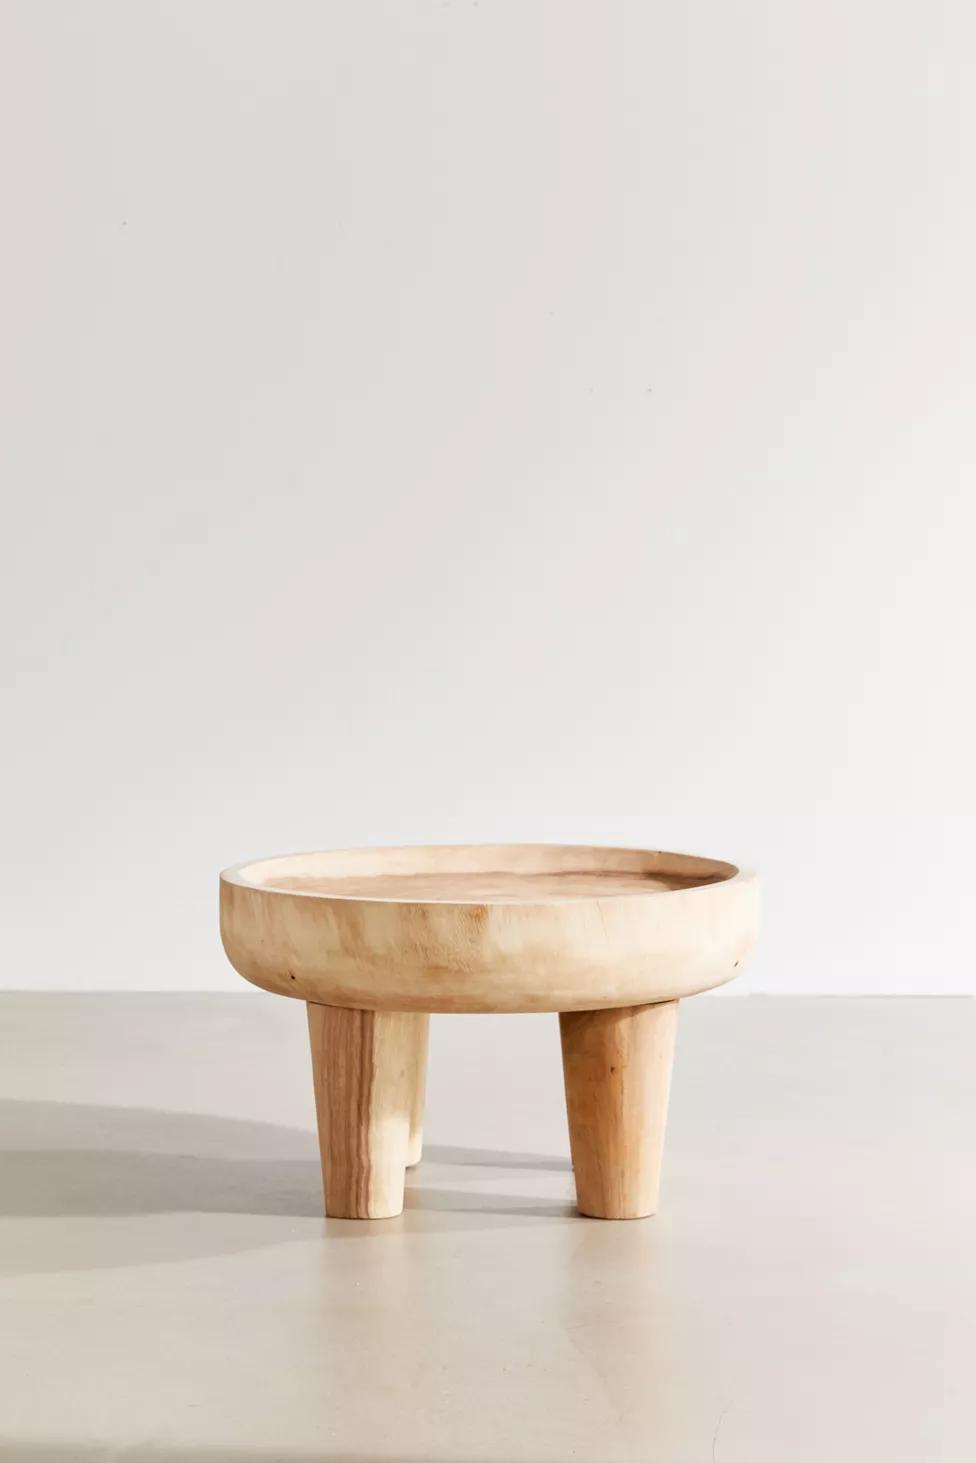 Kia Round Side Table In 2020 Round Side Table Side Table Side Table Wood [ 1463 x 976 Pixel ]